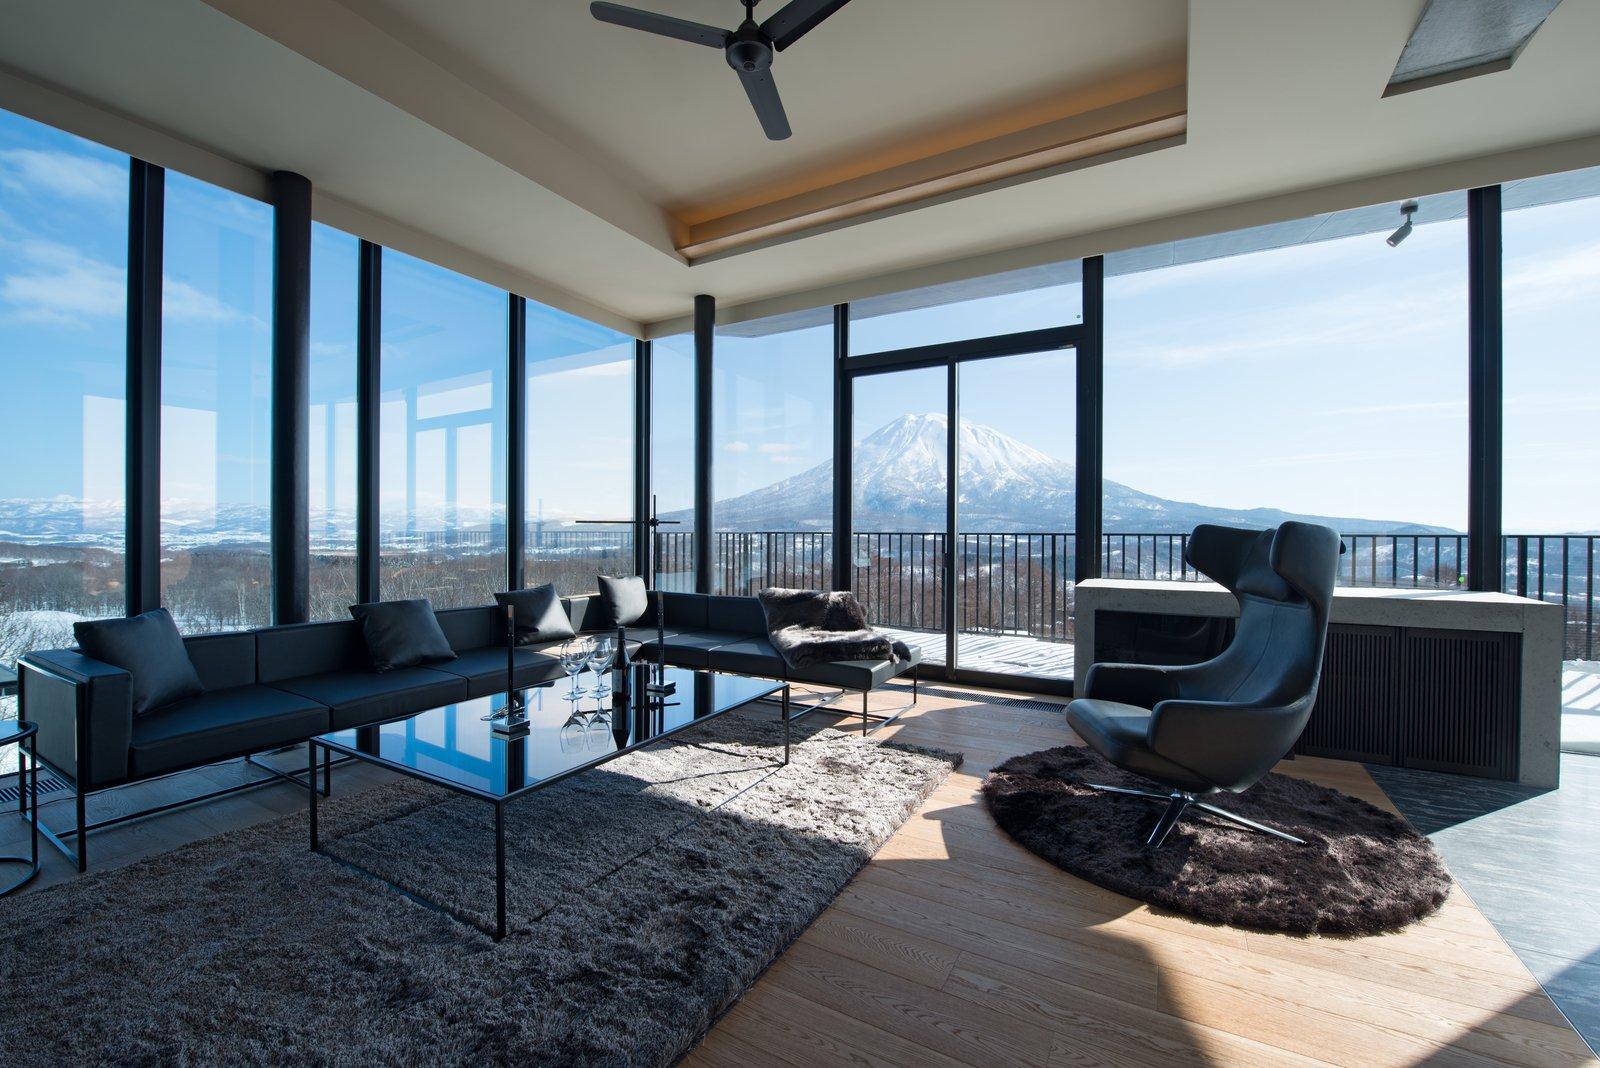 Muse niseko 601 2 bedroom penthouse large